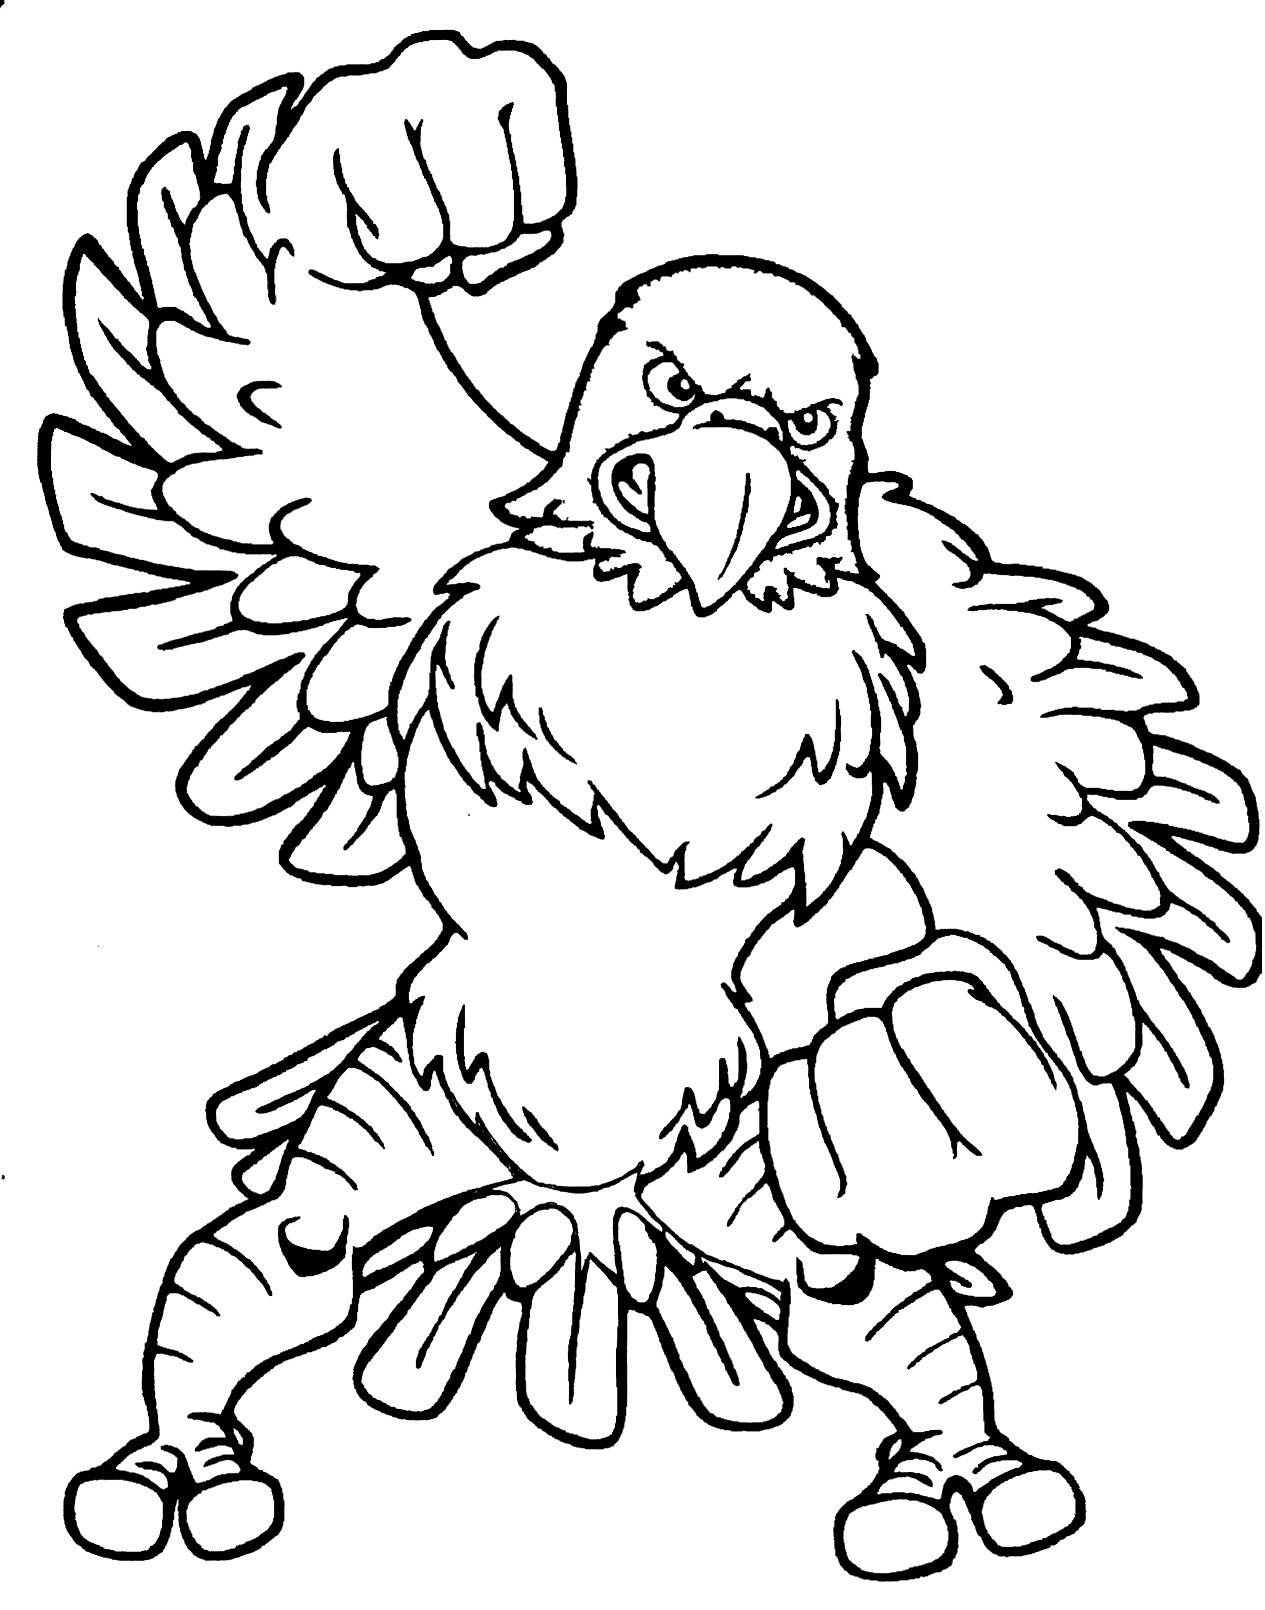 philadelphia eagle coloring pages - photo#26